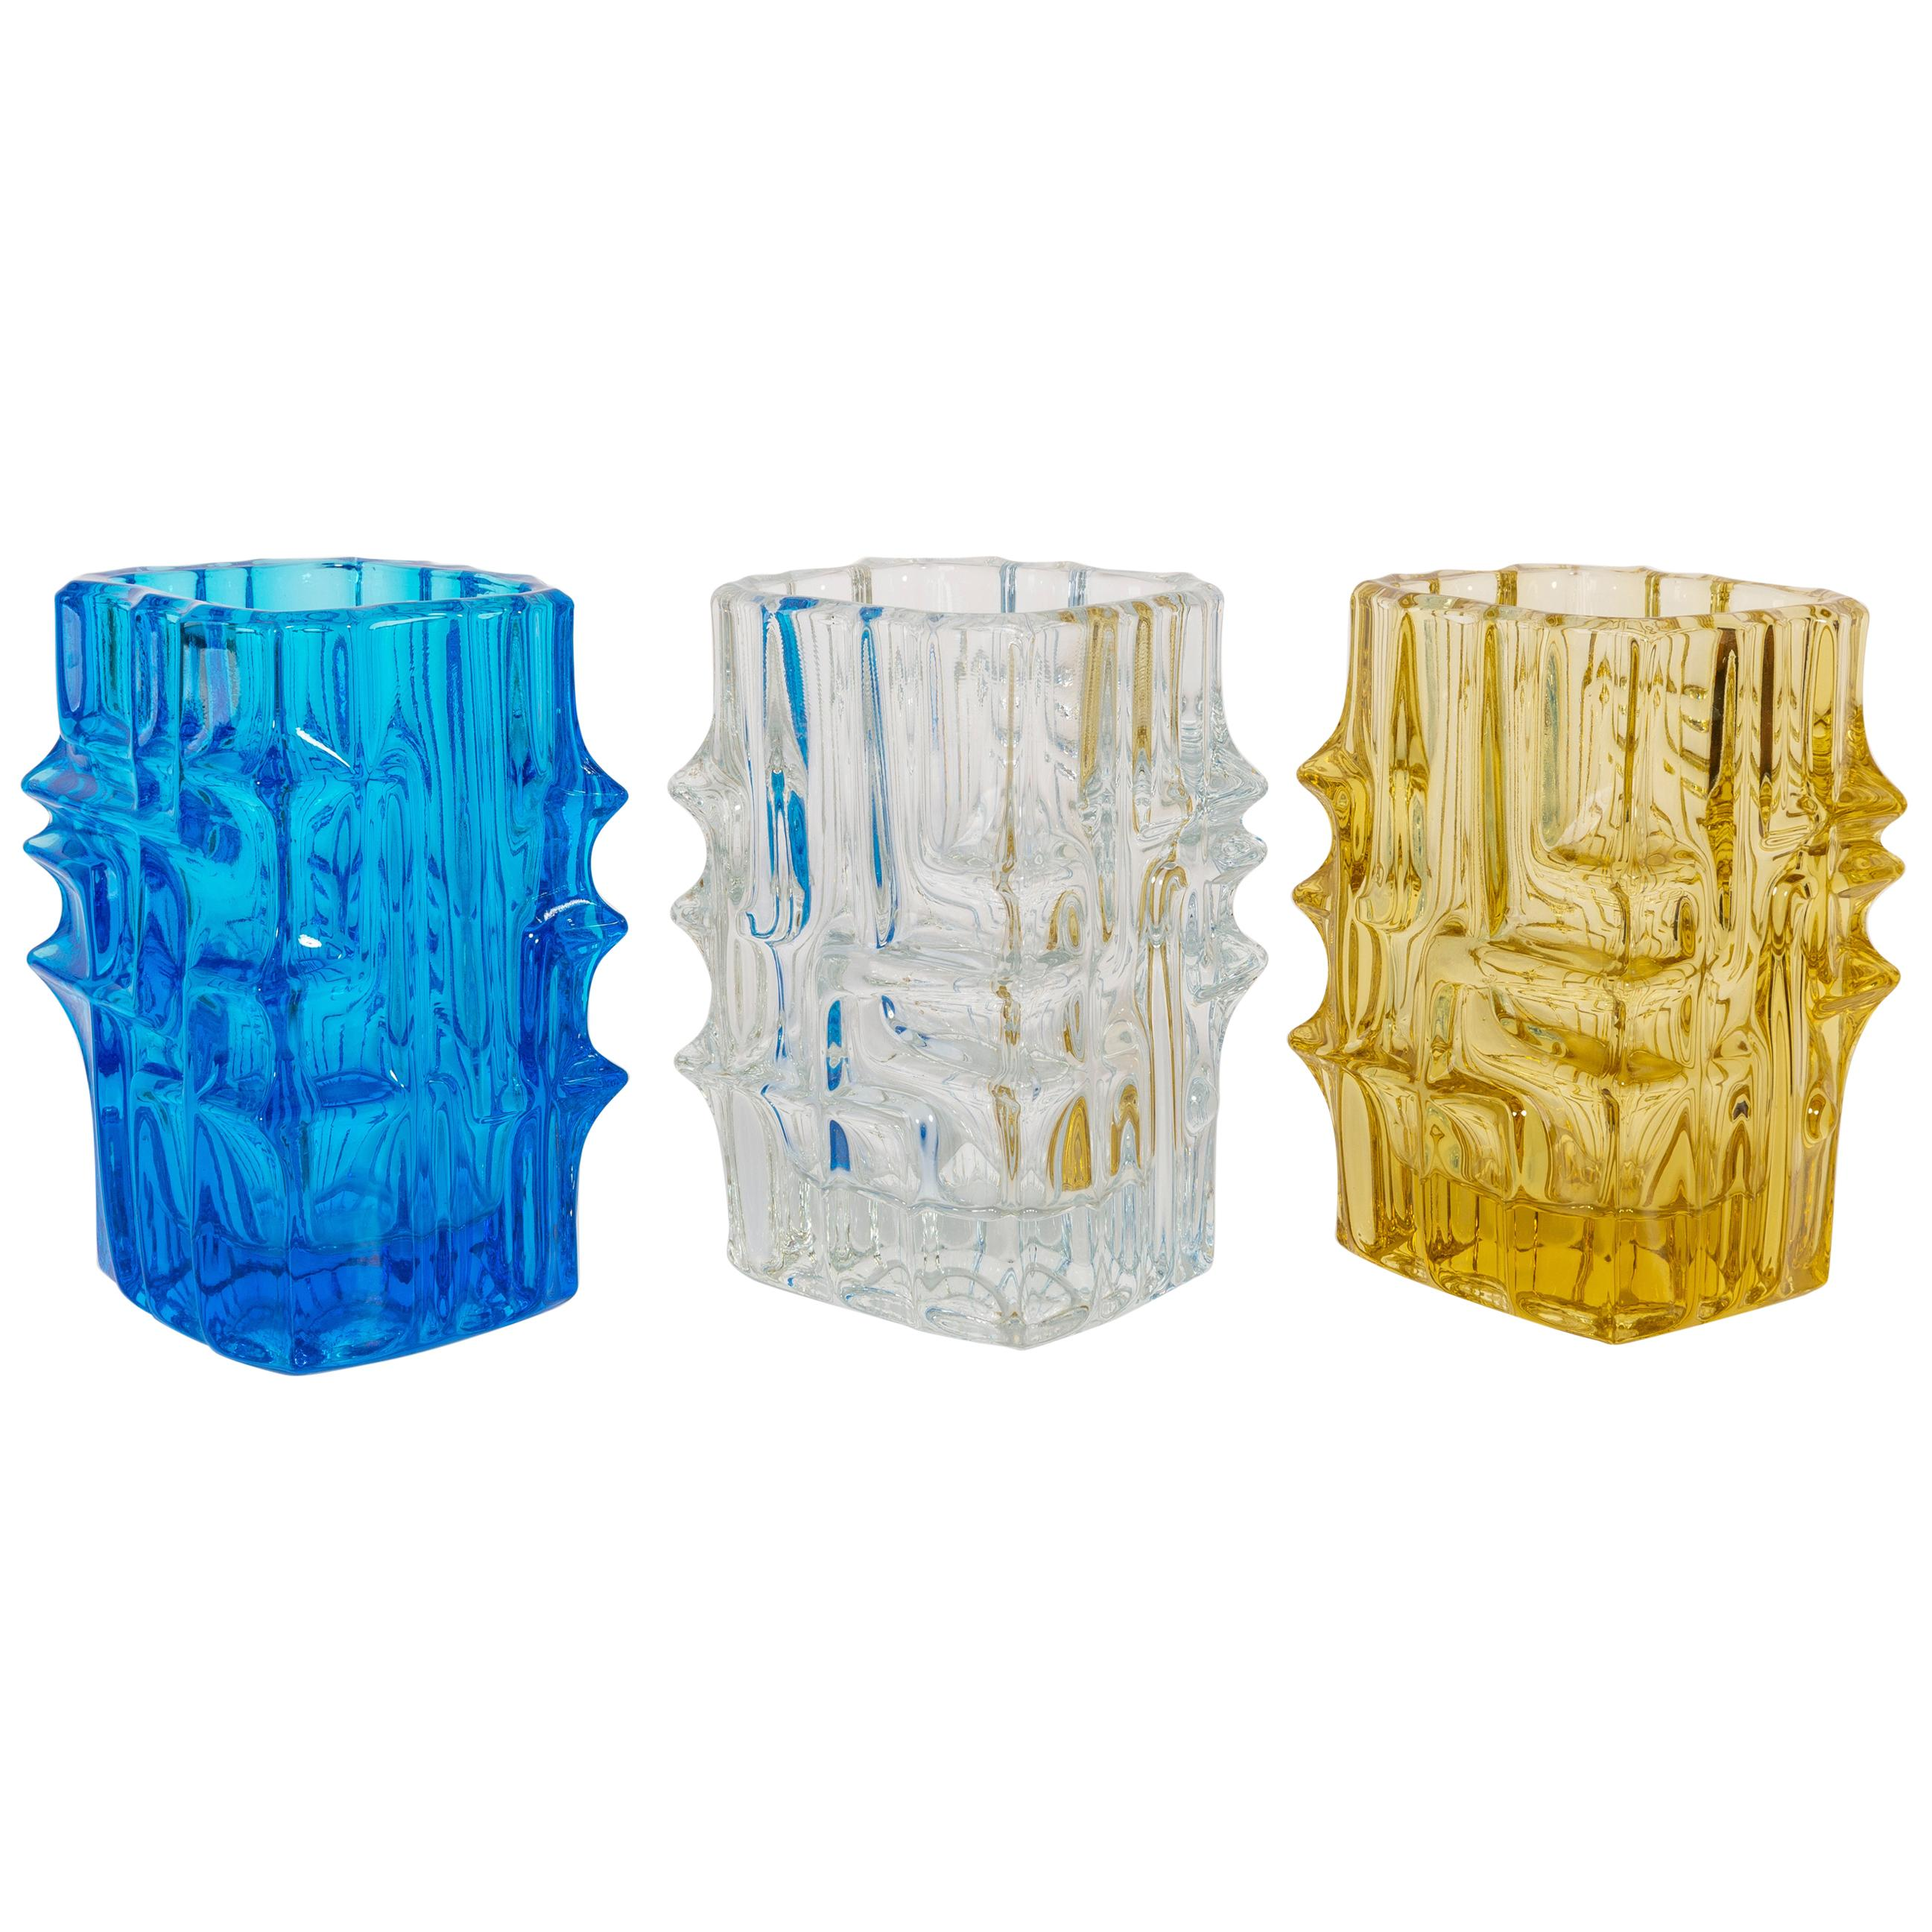 Set of 3 Vases by Vladislav Urban for Sklo Union, 20th Century, Europe, 1960s